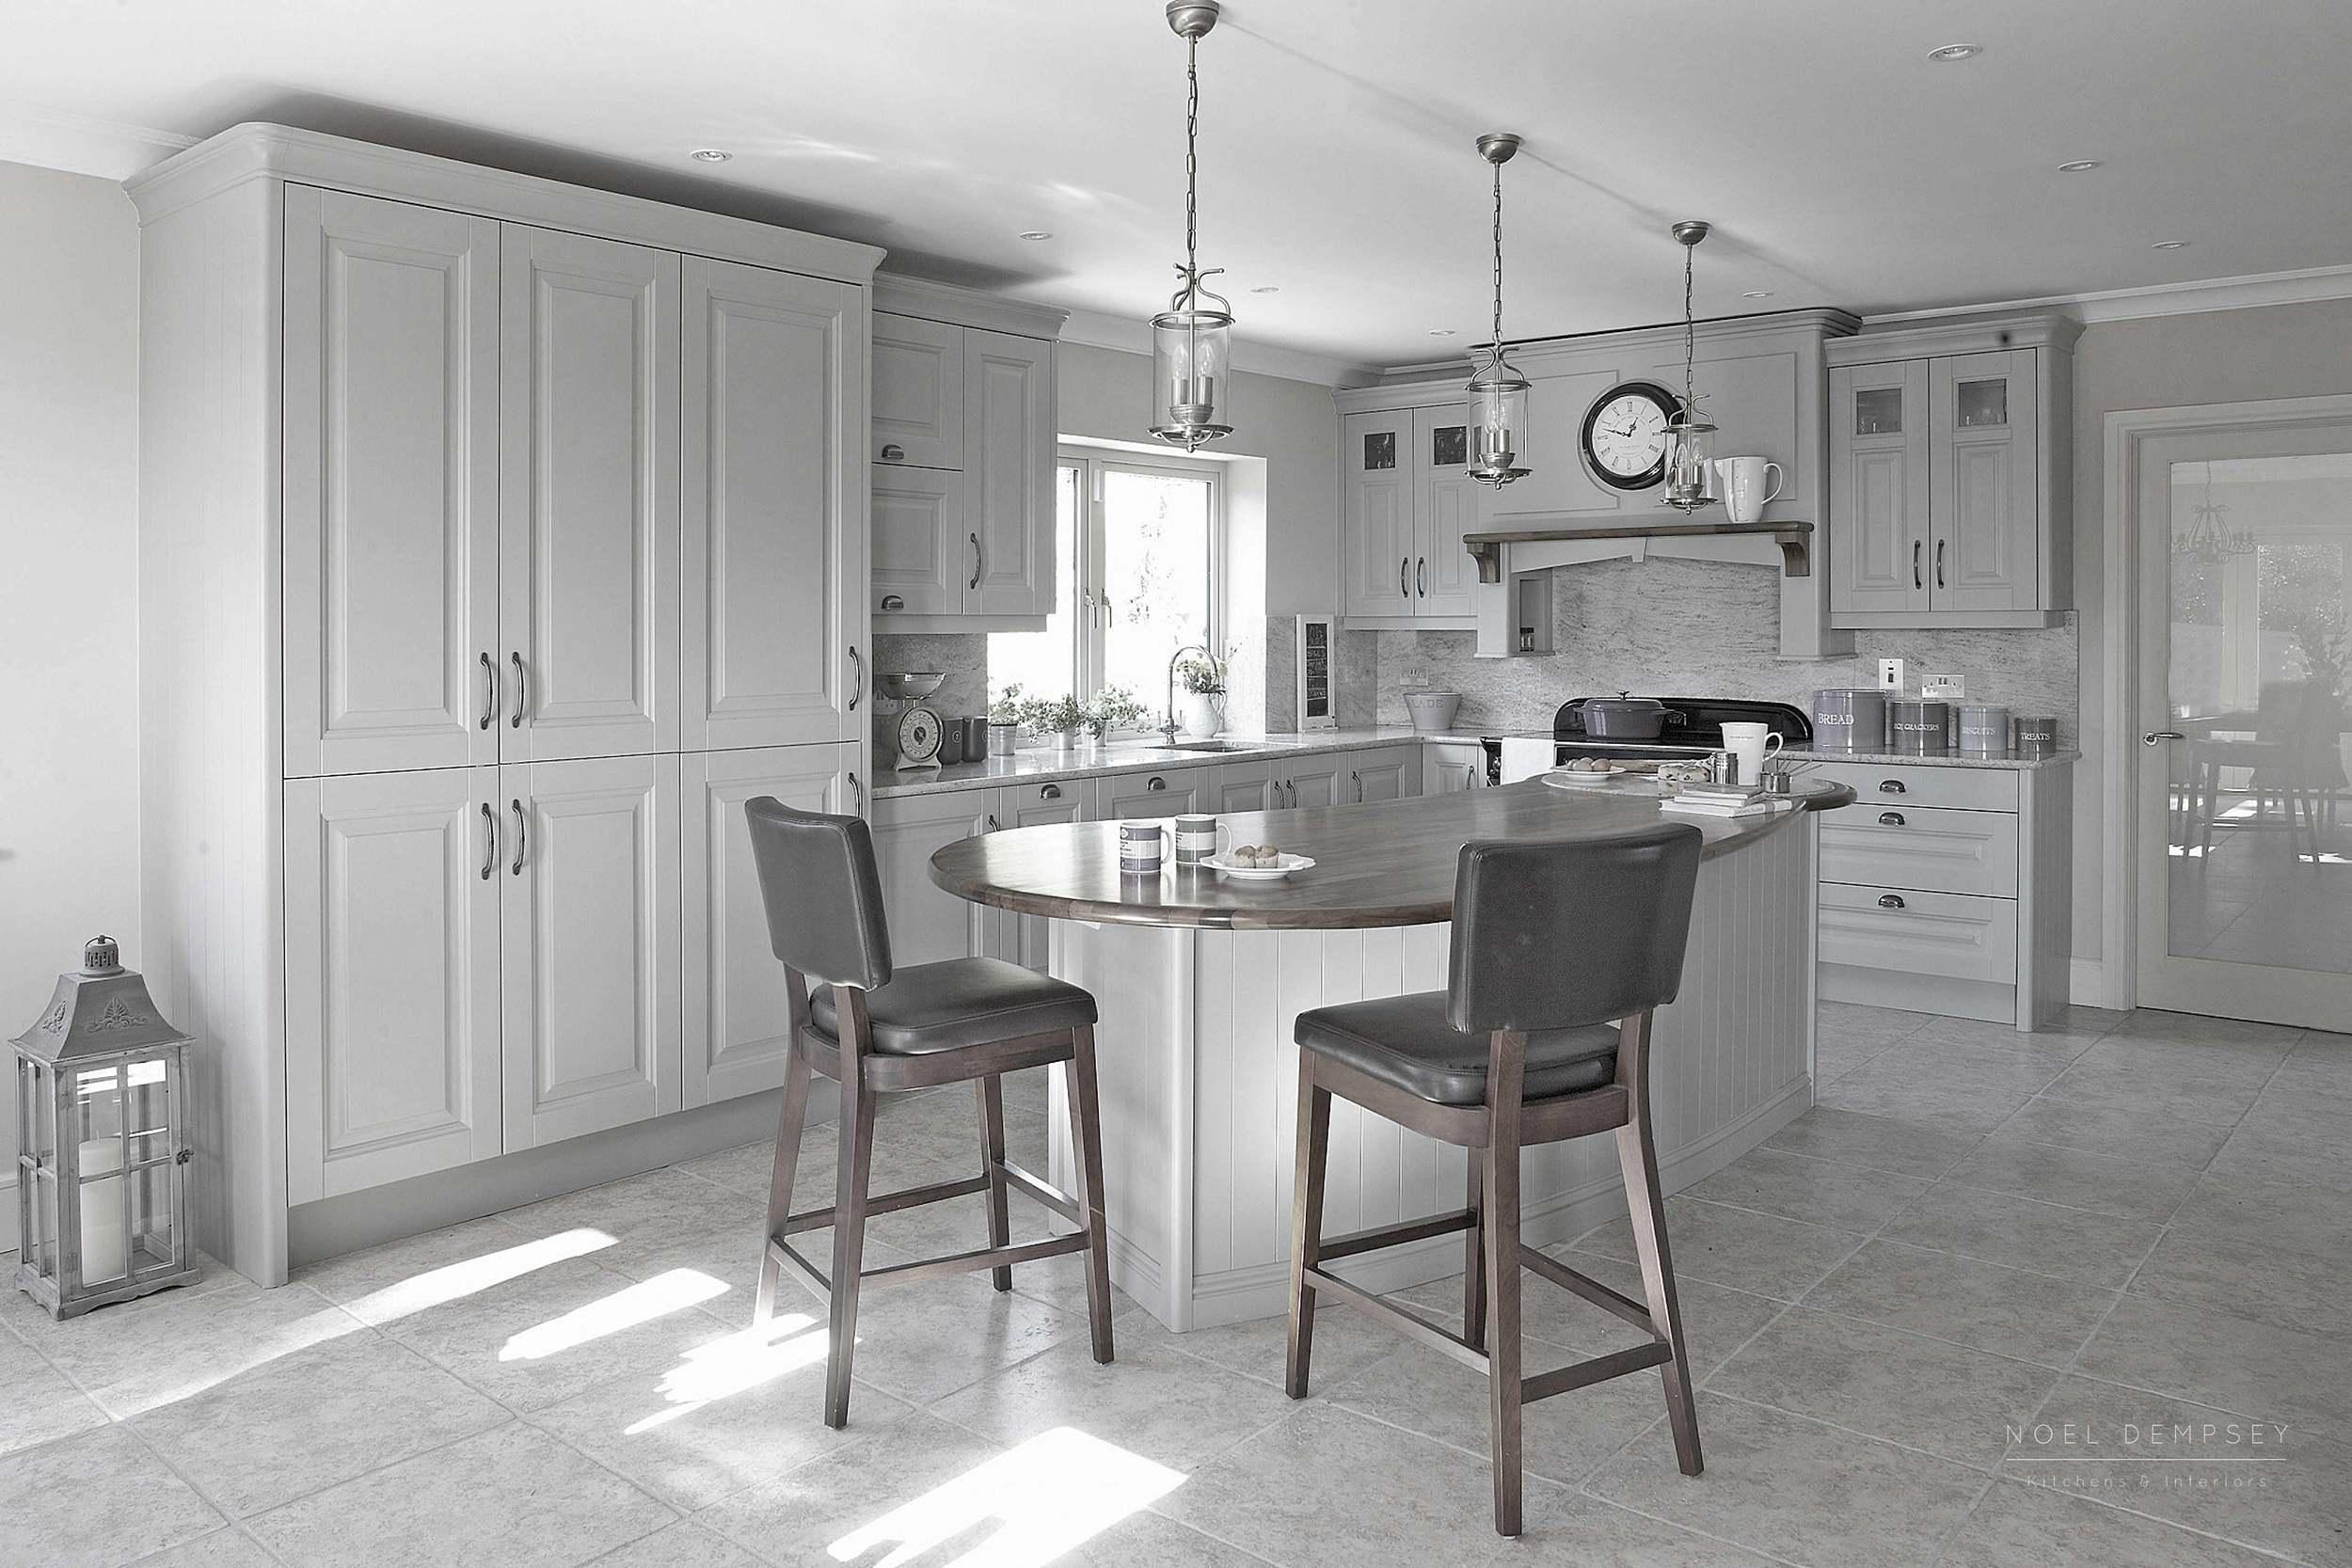 Hand painted kitchen - Noel Dempsey